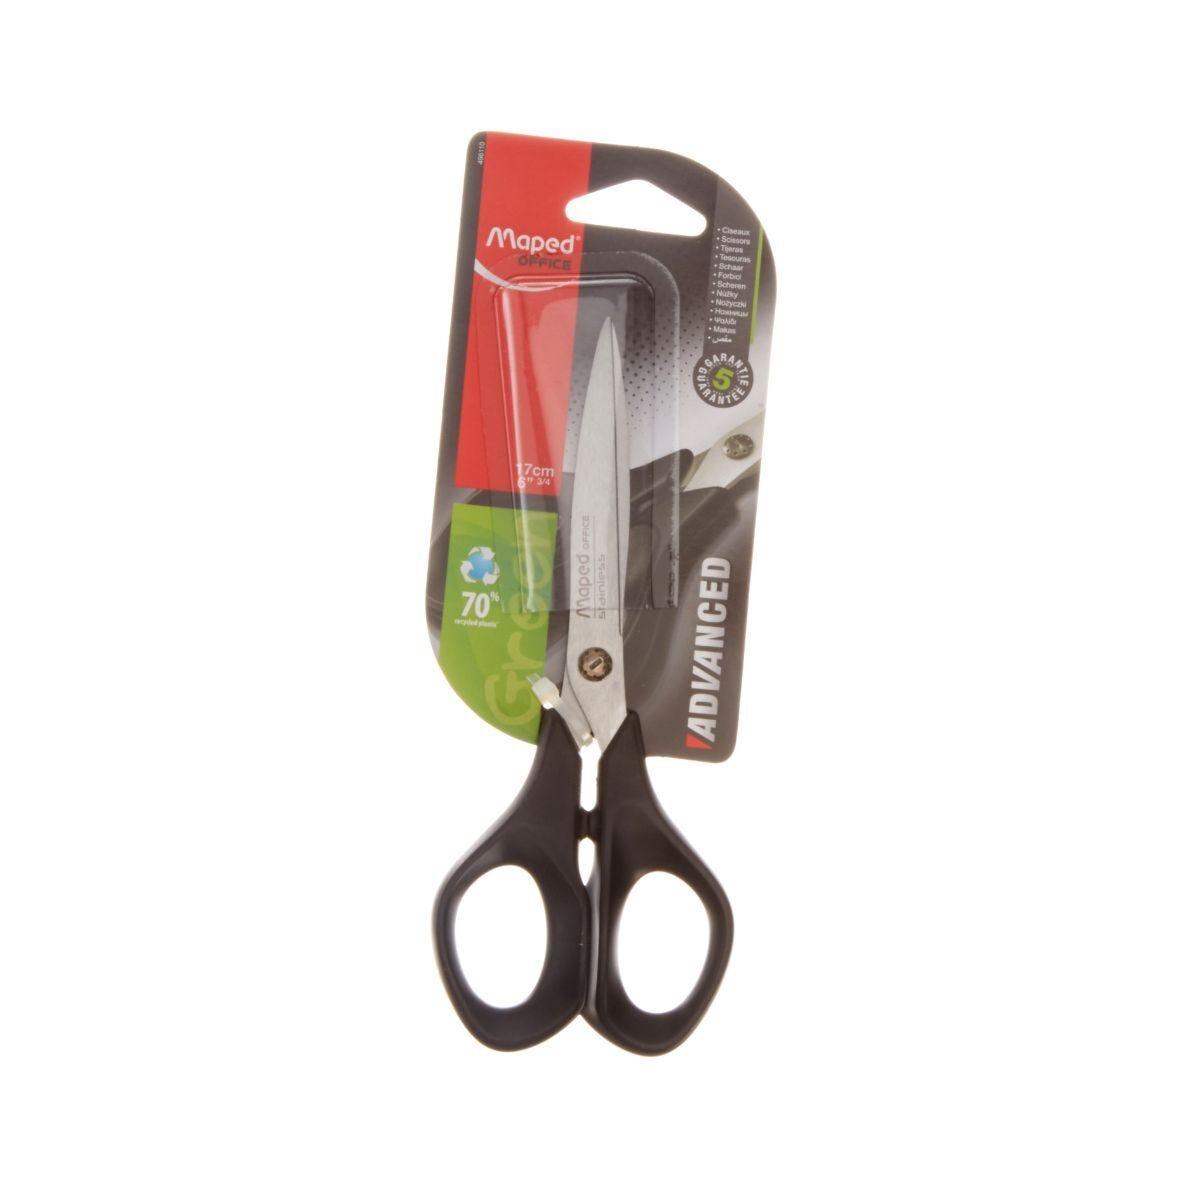 Maped Advanced 17cm Scissors